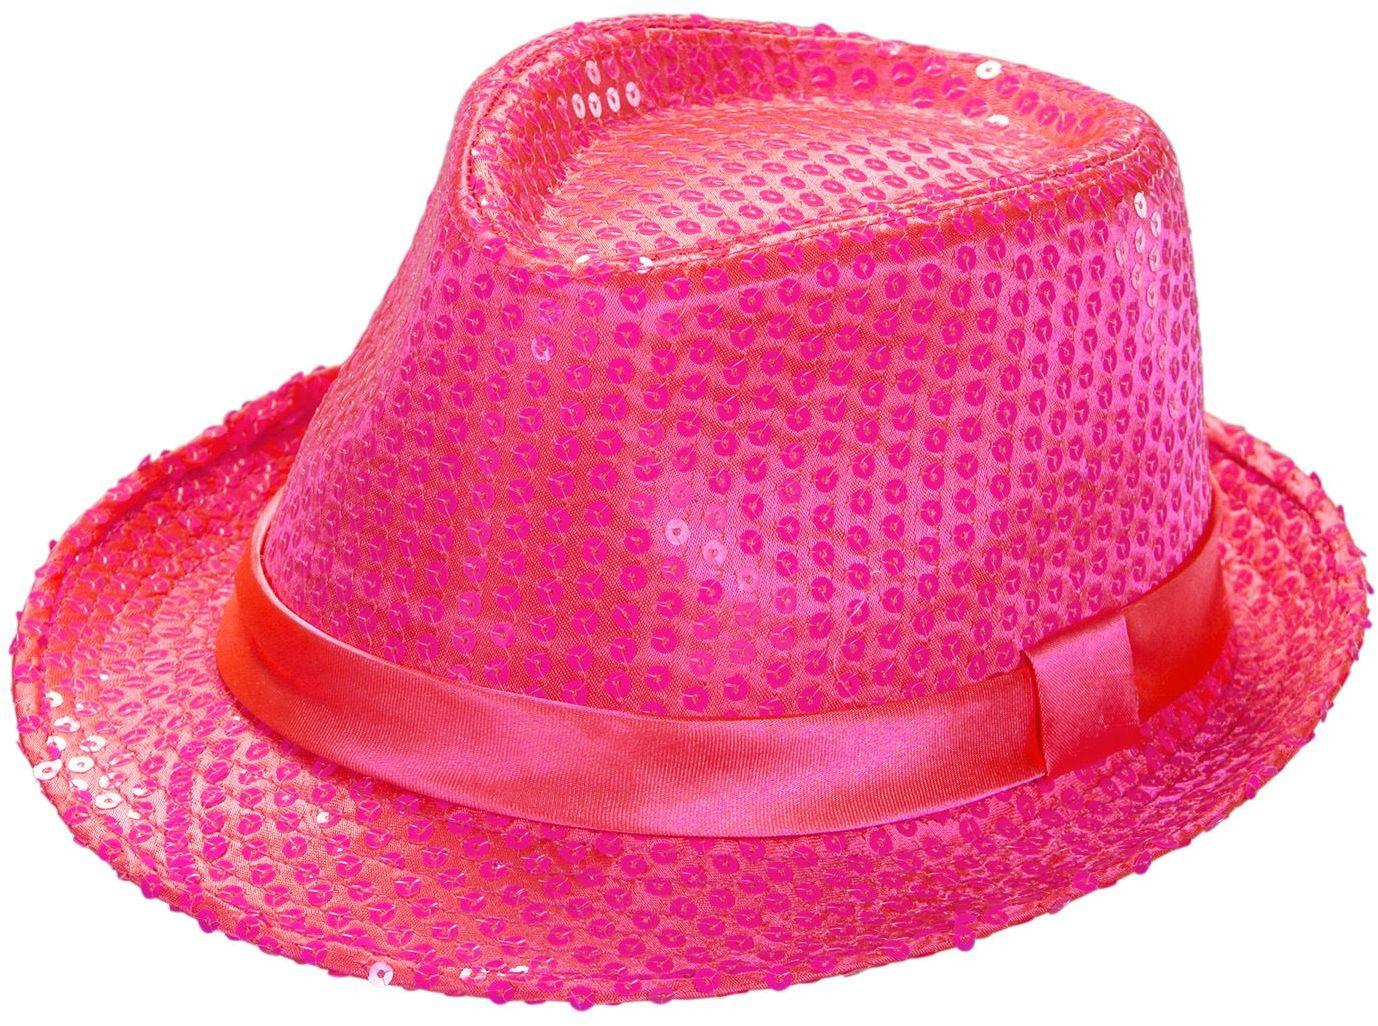 Neon roze pailletten fedora